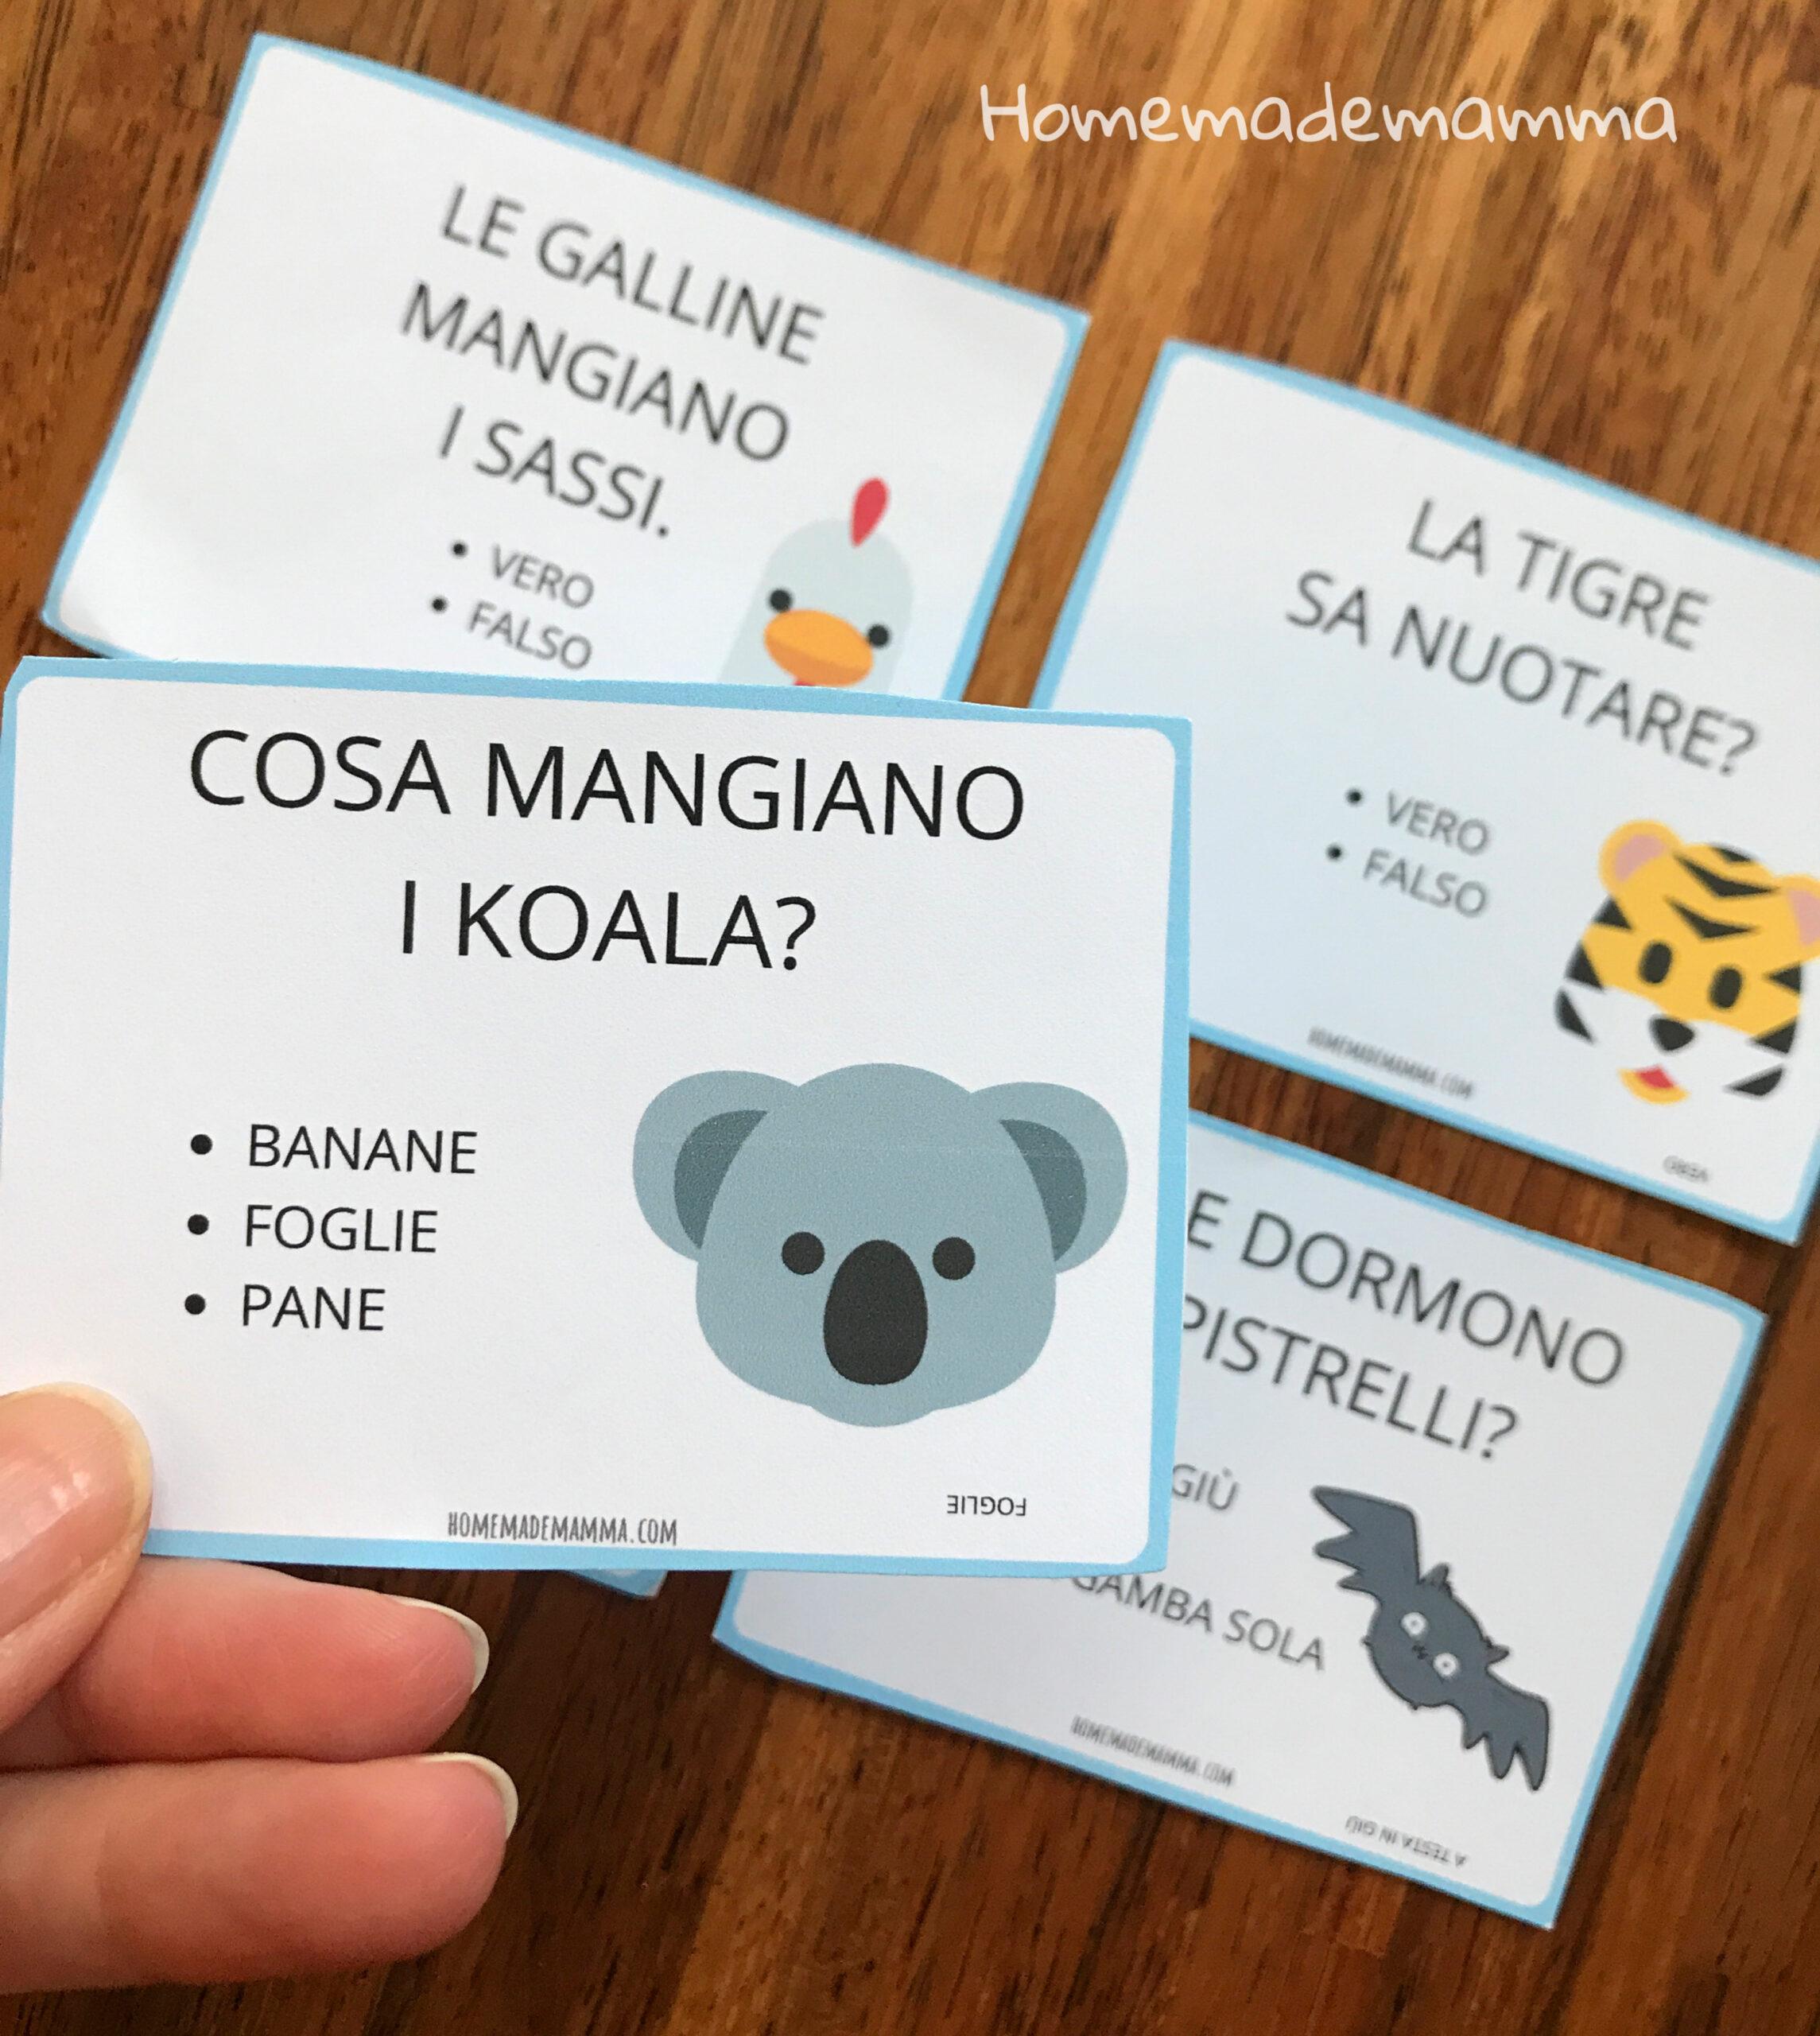 Carte curiosità animali da stampare indovinelli bambini